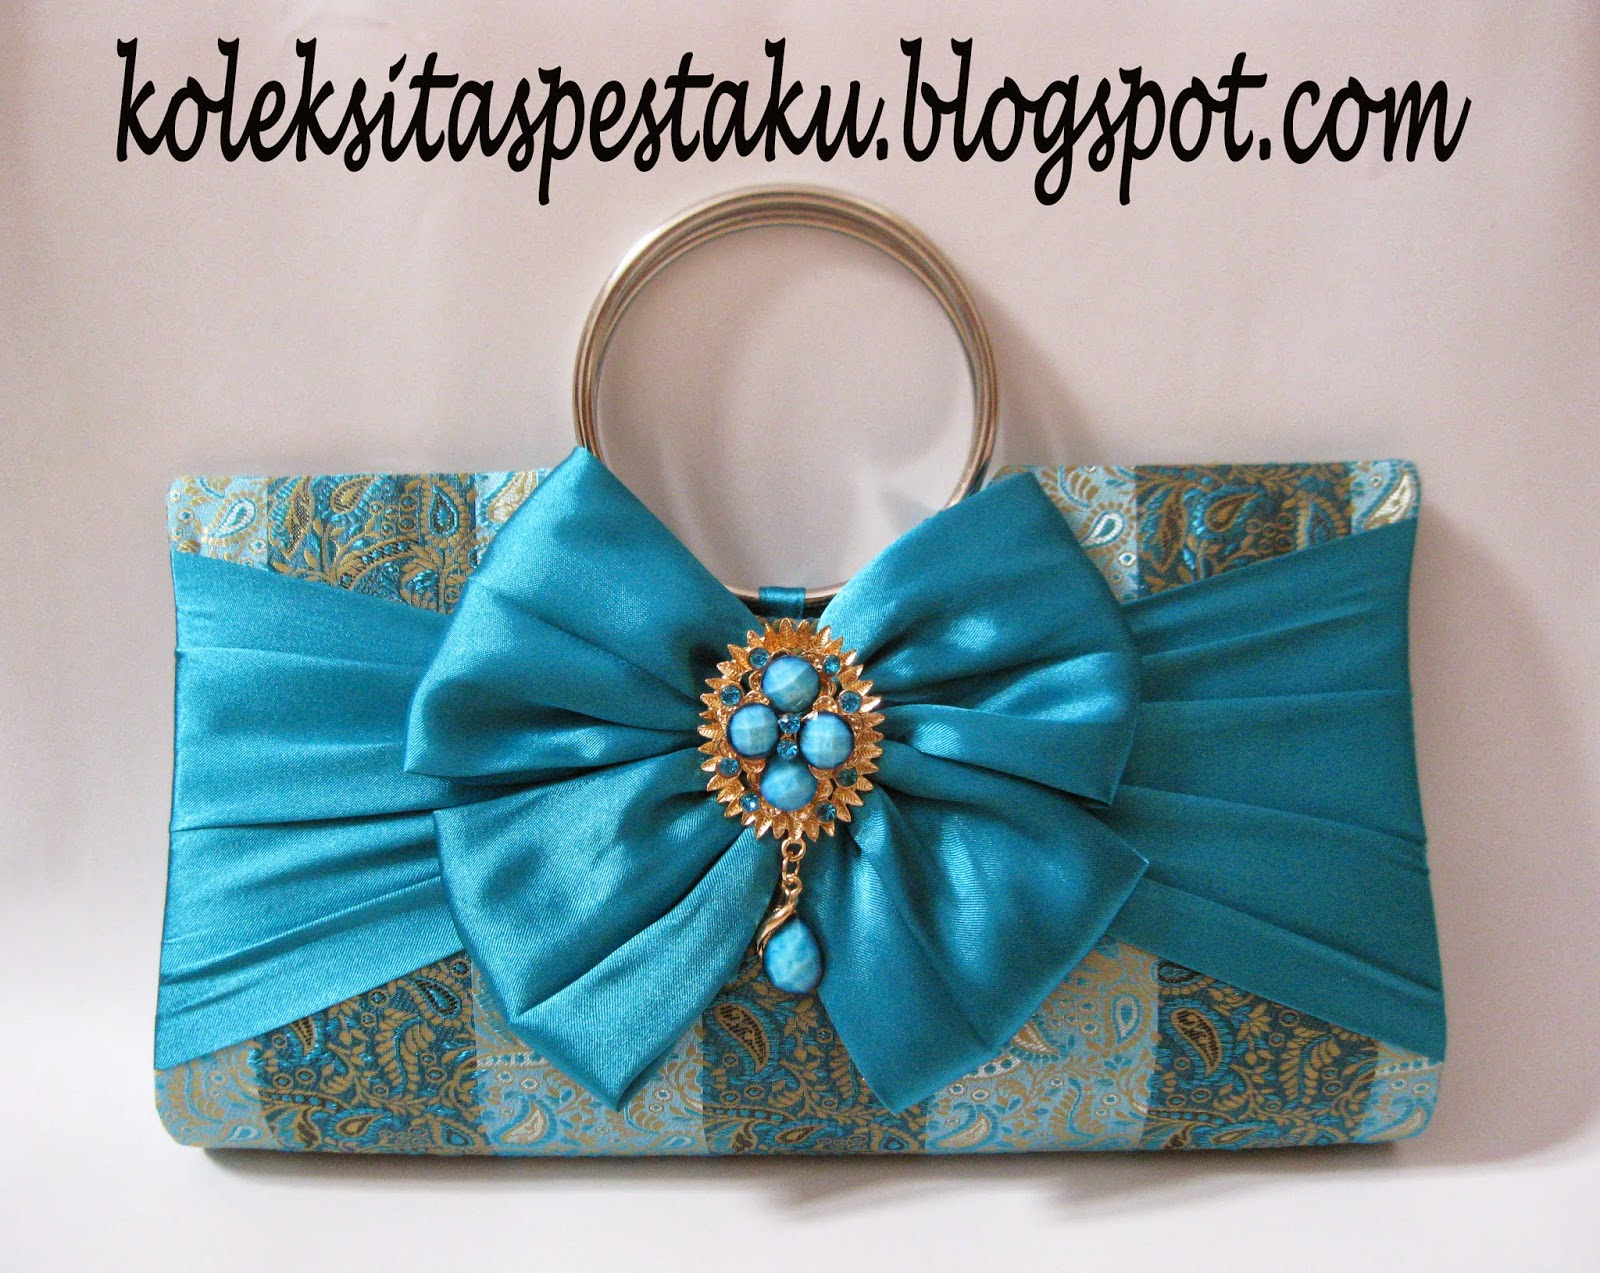 Tas Pesta - Clutch Bag  taspestaku  Model Terbaru dari Toko Online ... f9ce2b62e7